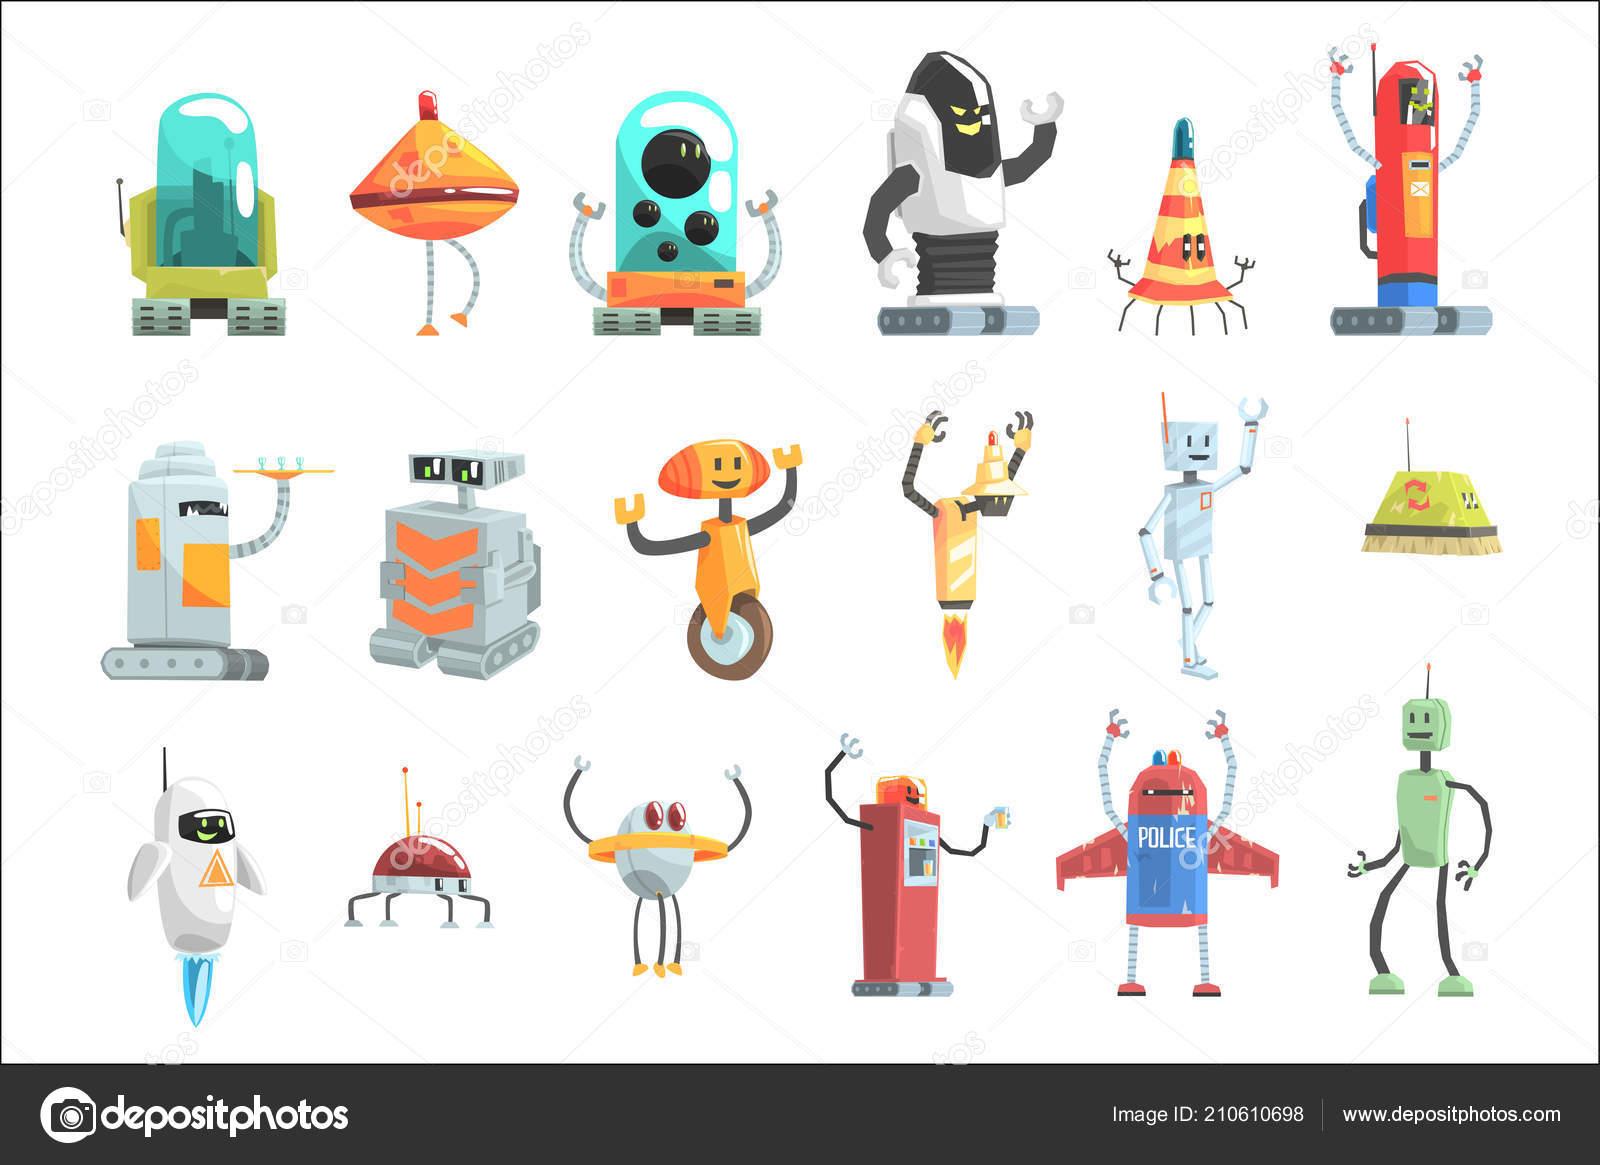 Ruzne Design Verejne Sluzby Roboty Sada Barevne Karikatura Androidi